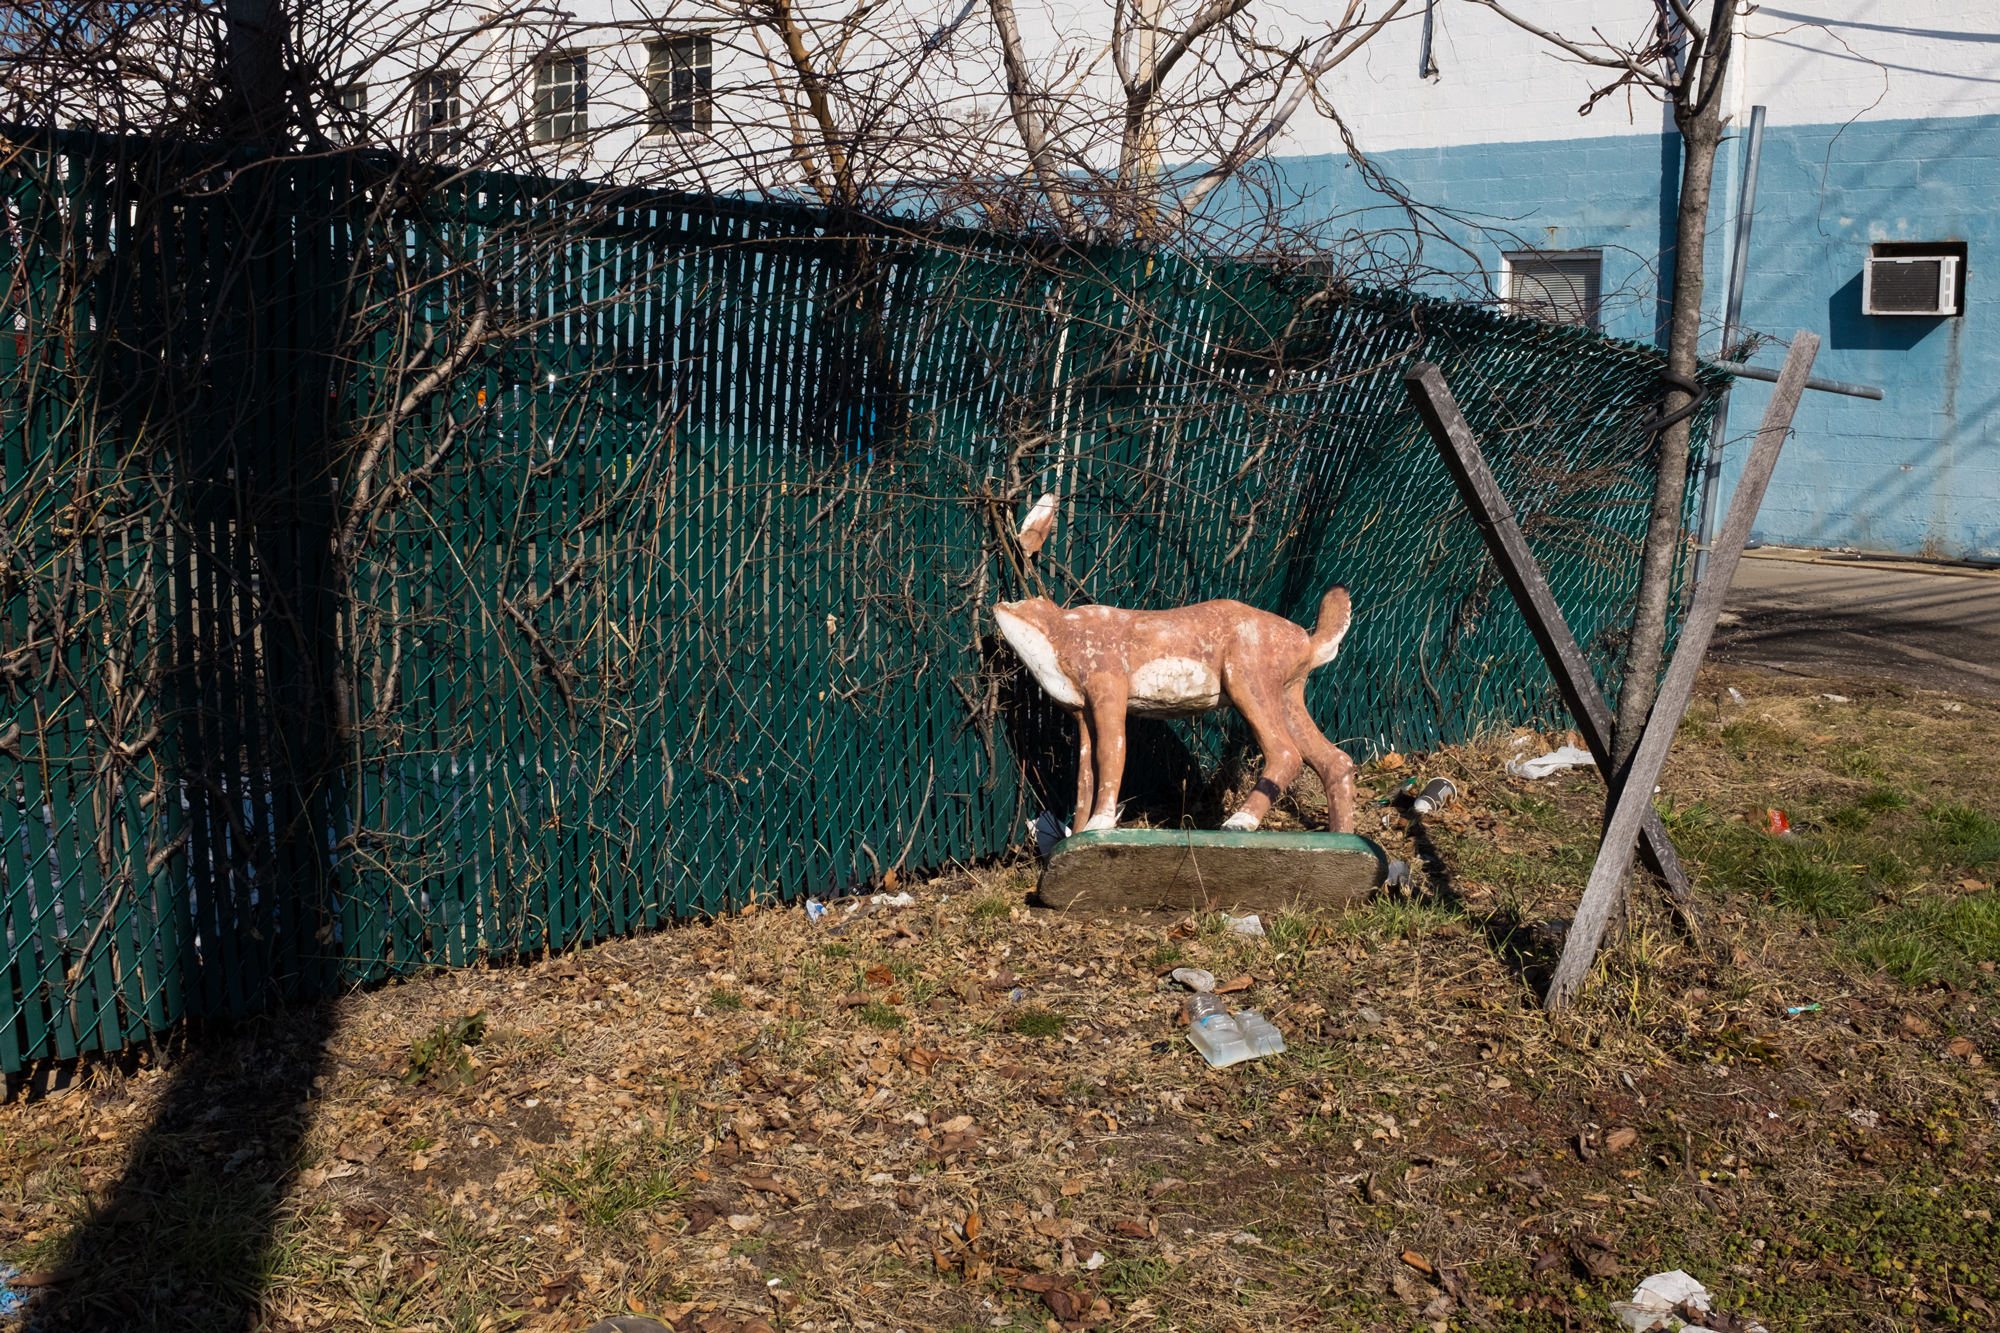 new-york-city-street-photographer-Zachary-Cabanas-5